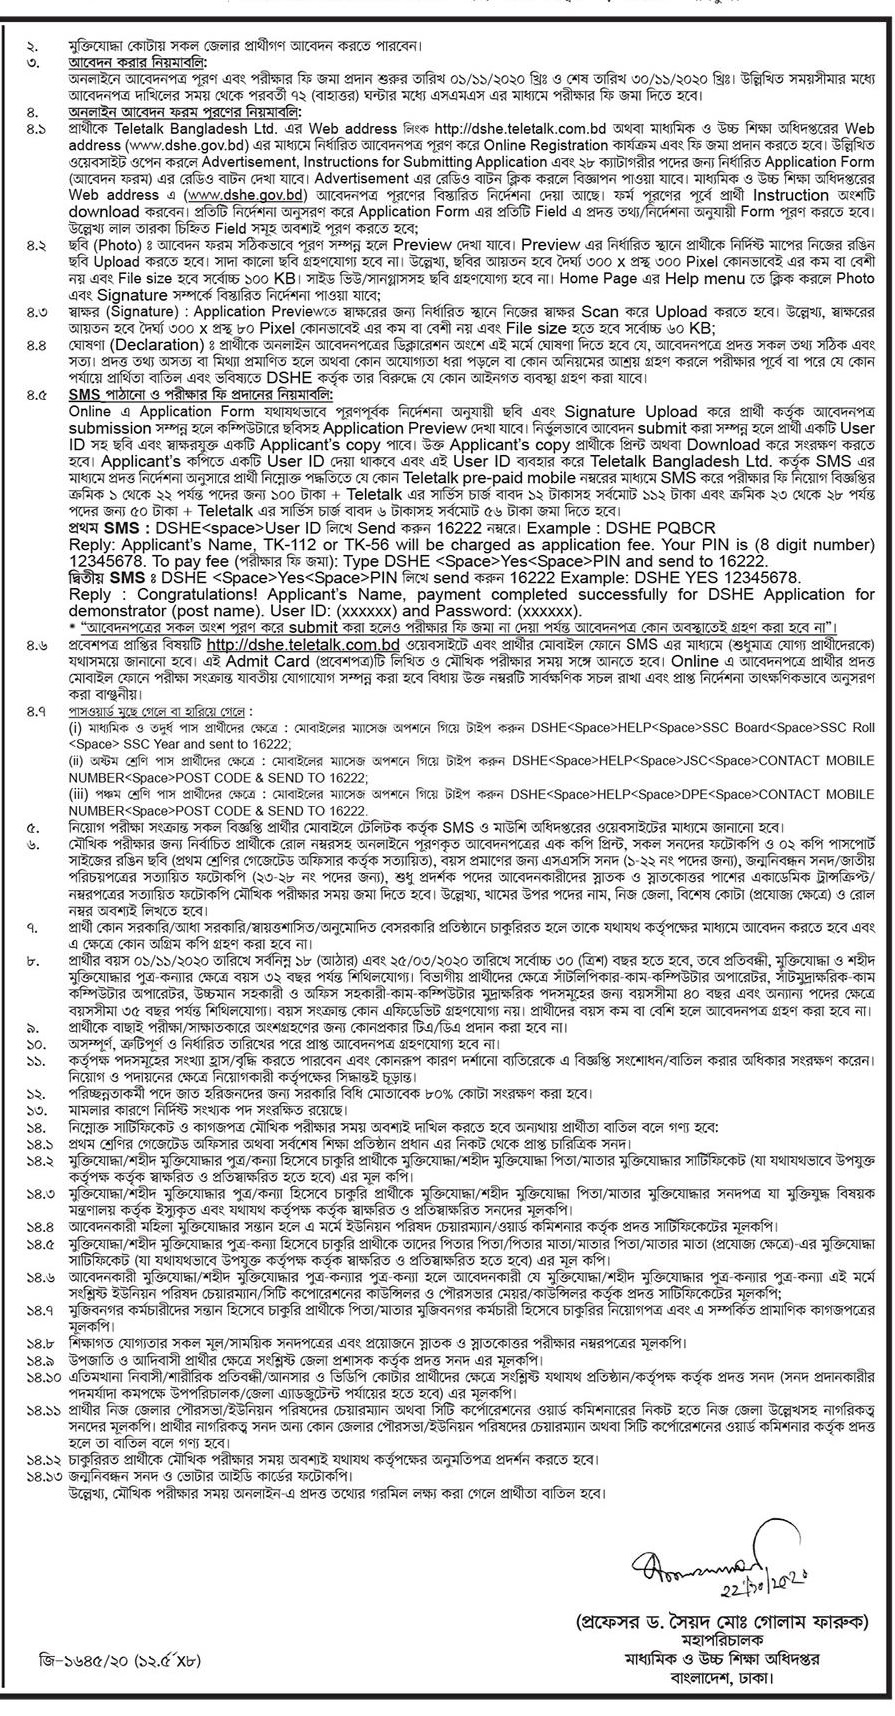 Secondary Higher Education Directorate DSHE Job Circular 2020